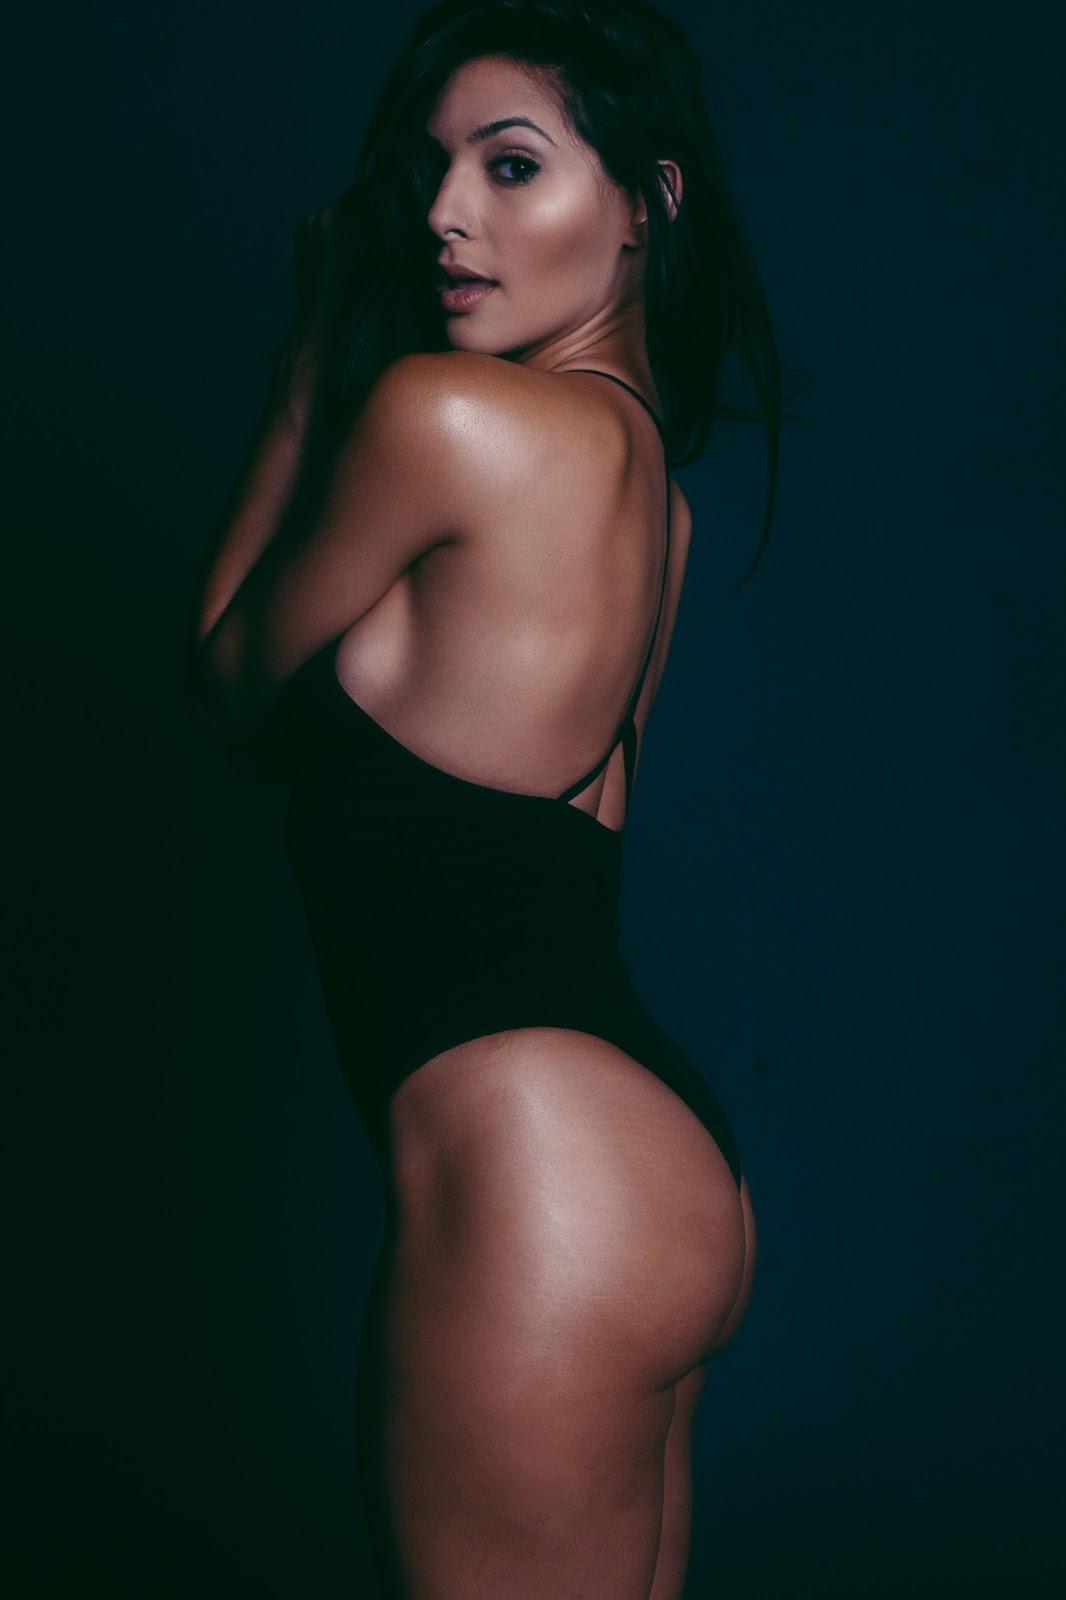 sexy hot model camila banus